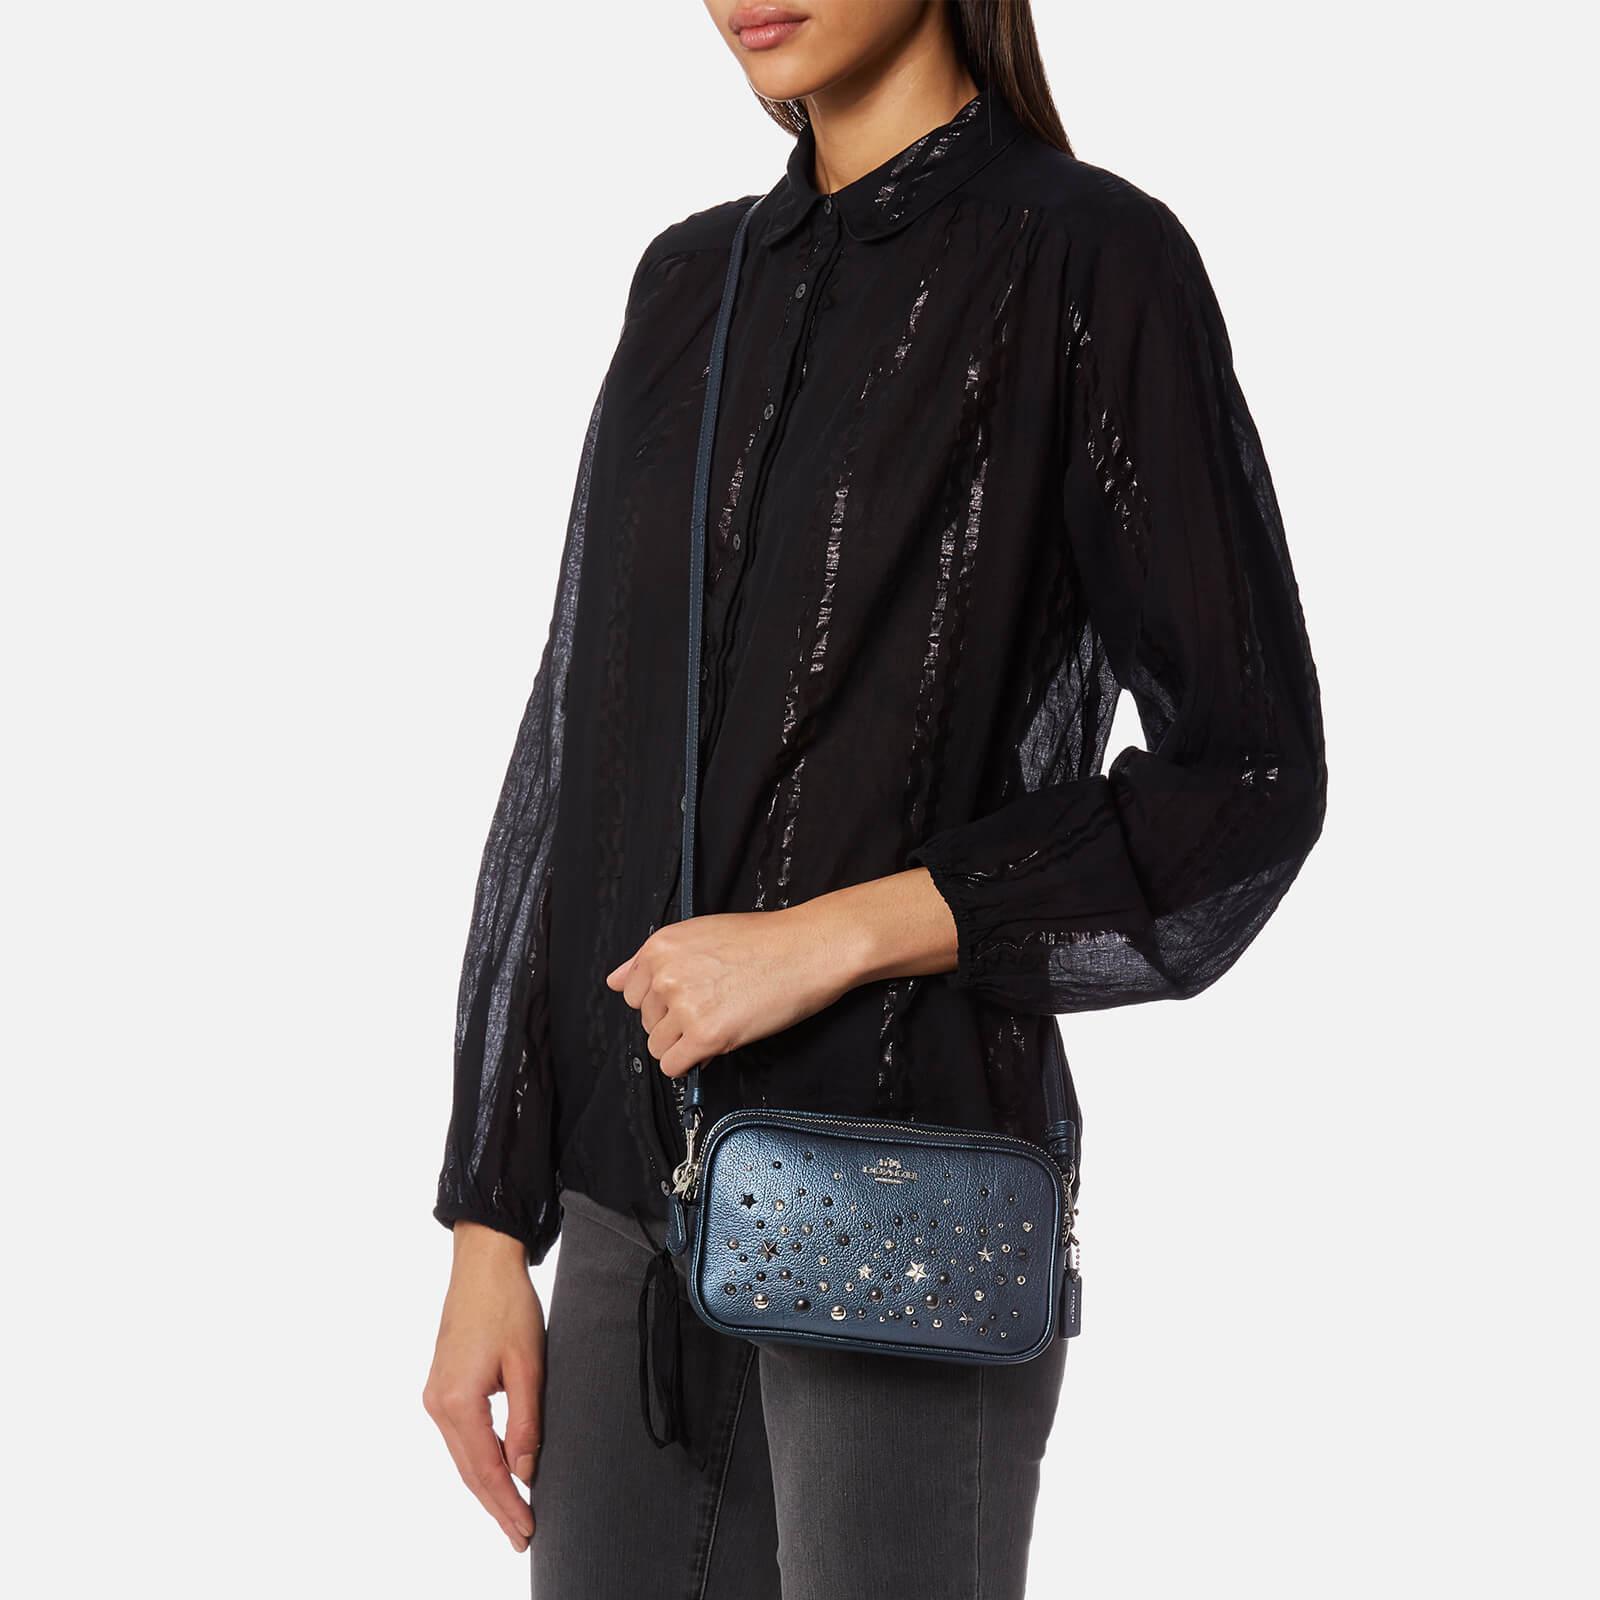 COACH Leather Star Rivet Cross Body Bag in Blue